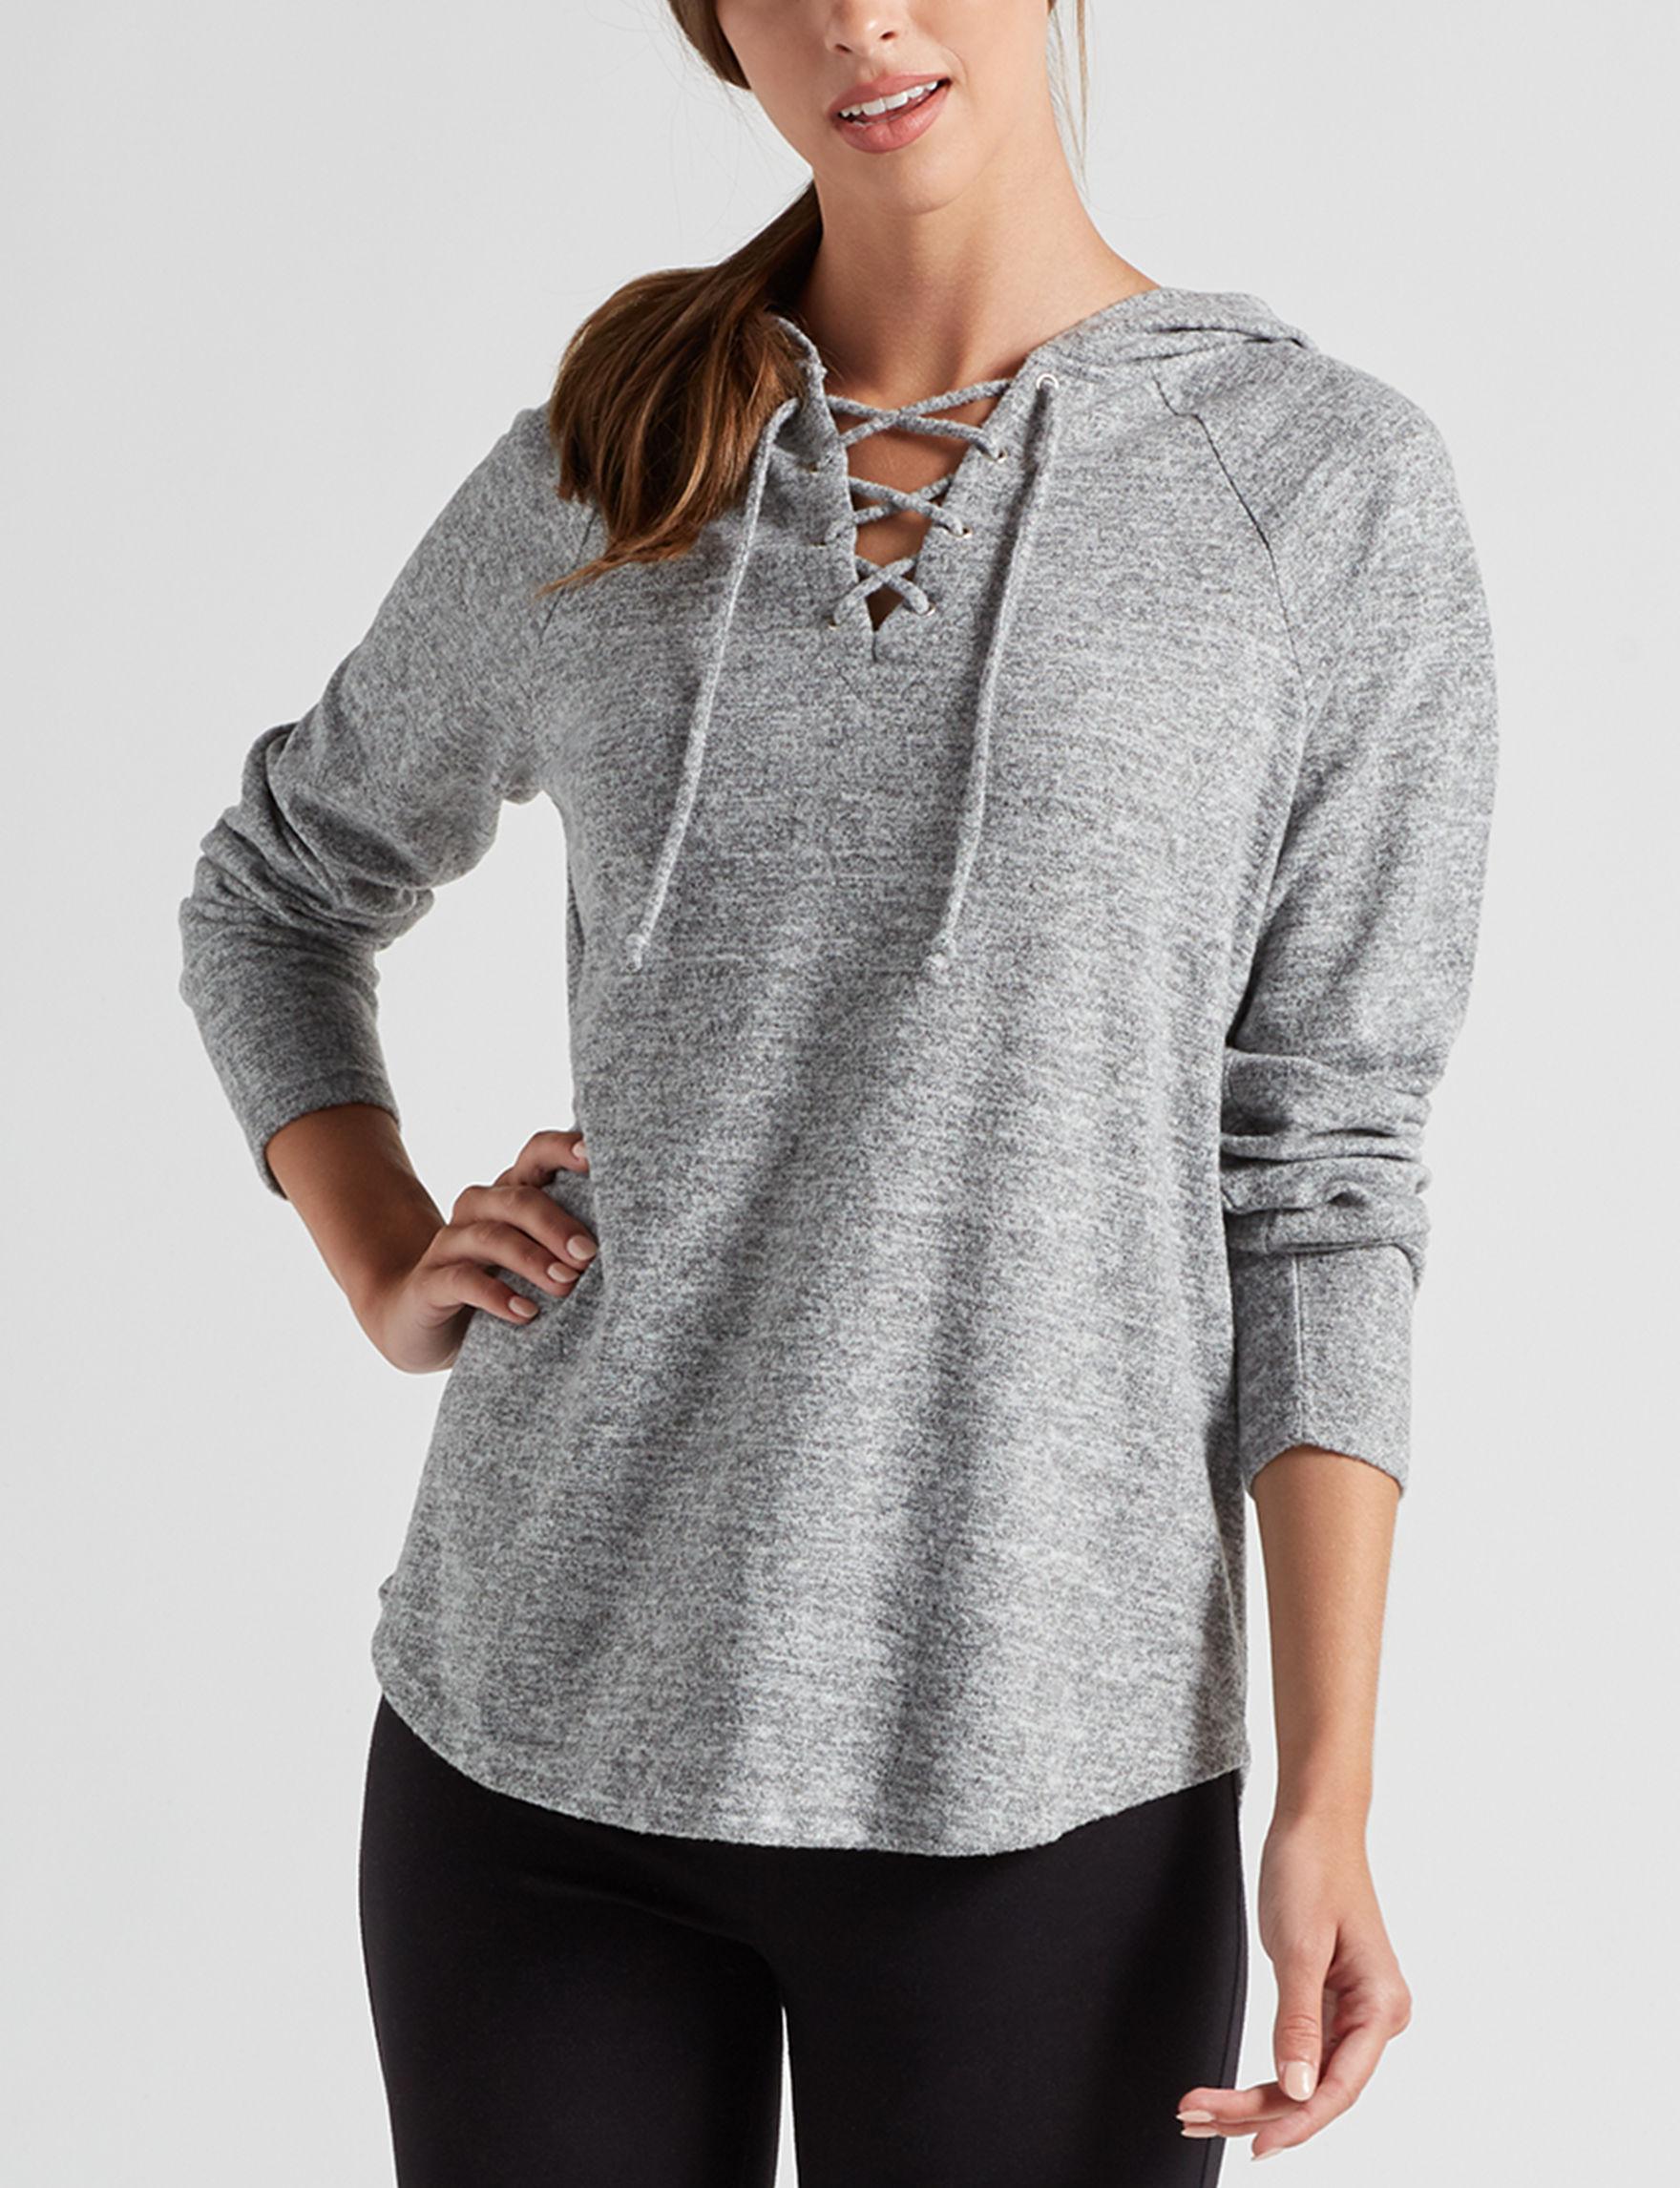 Isela Grey Shirts & Blouses